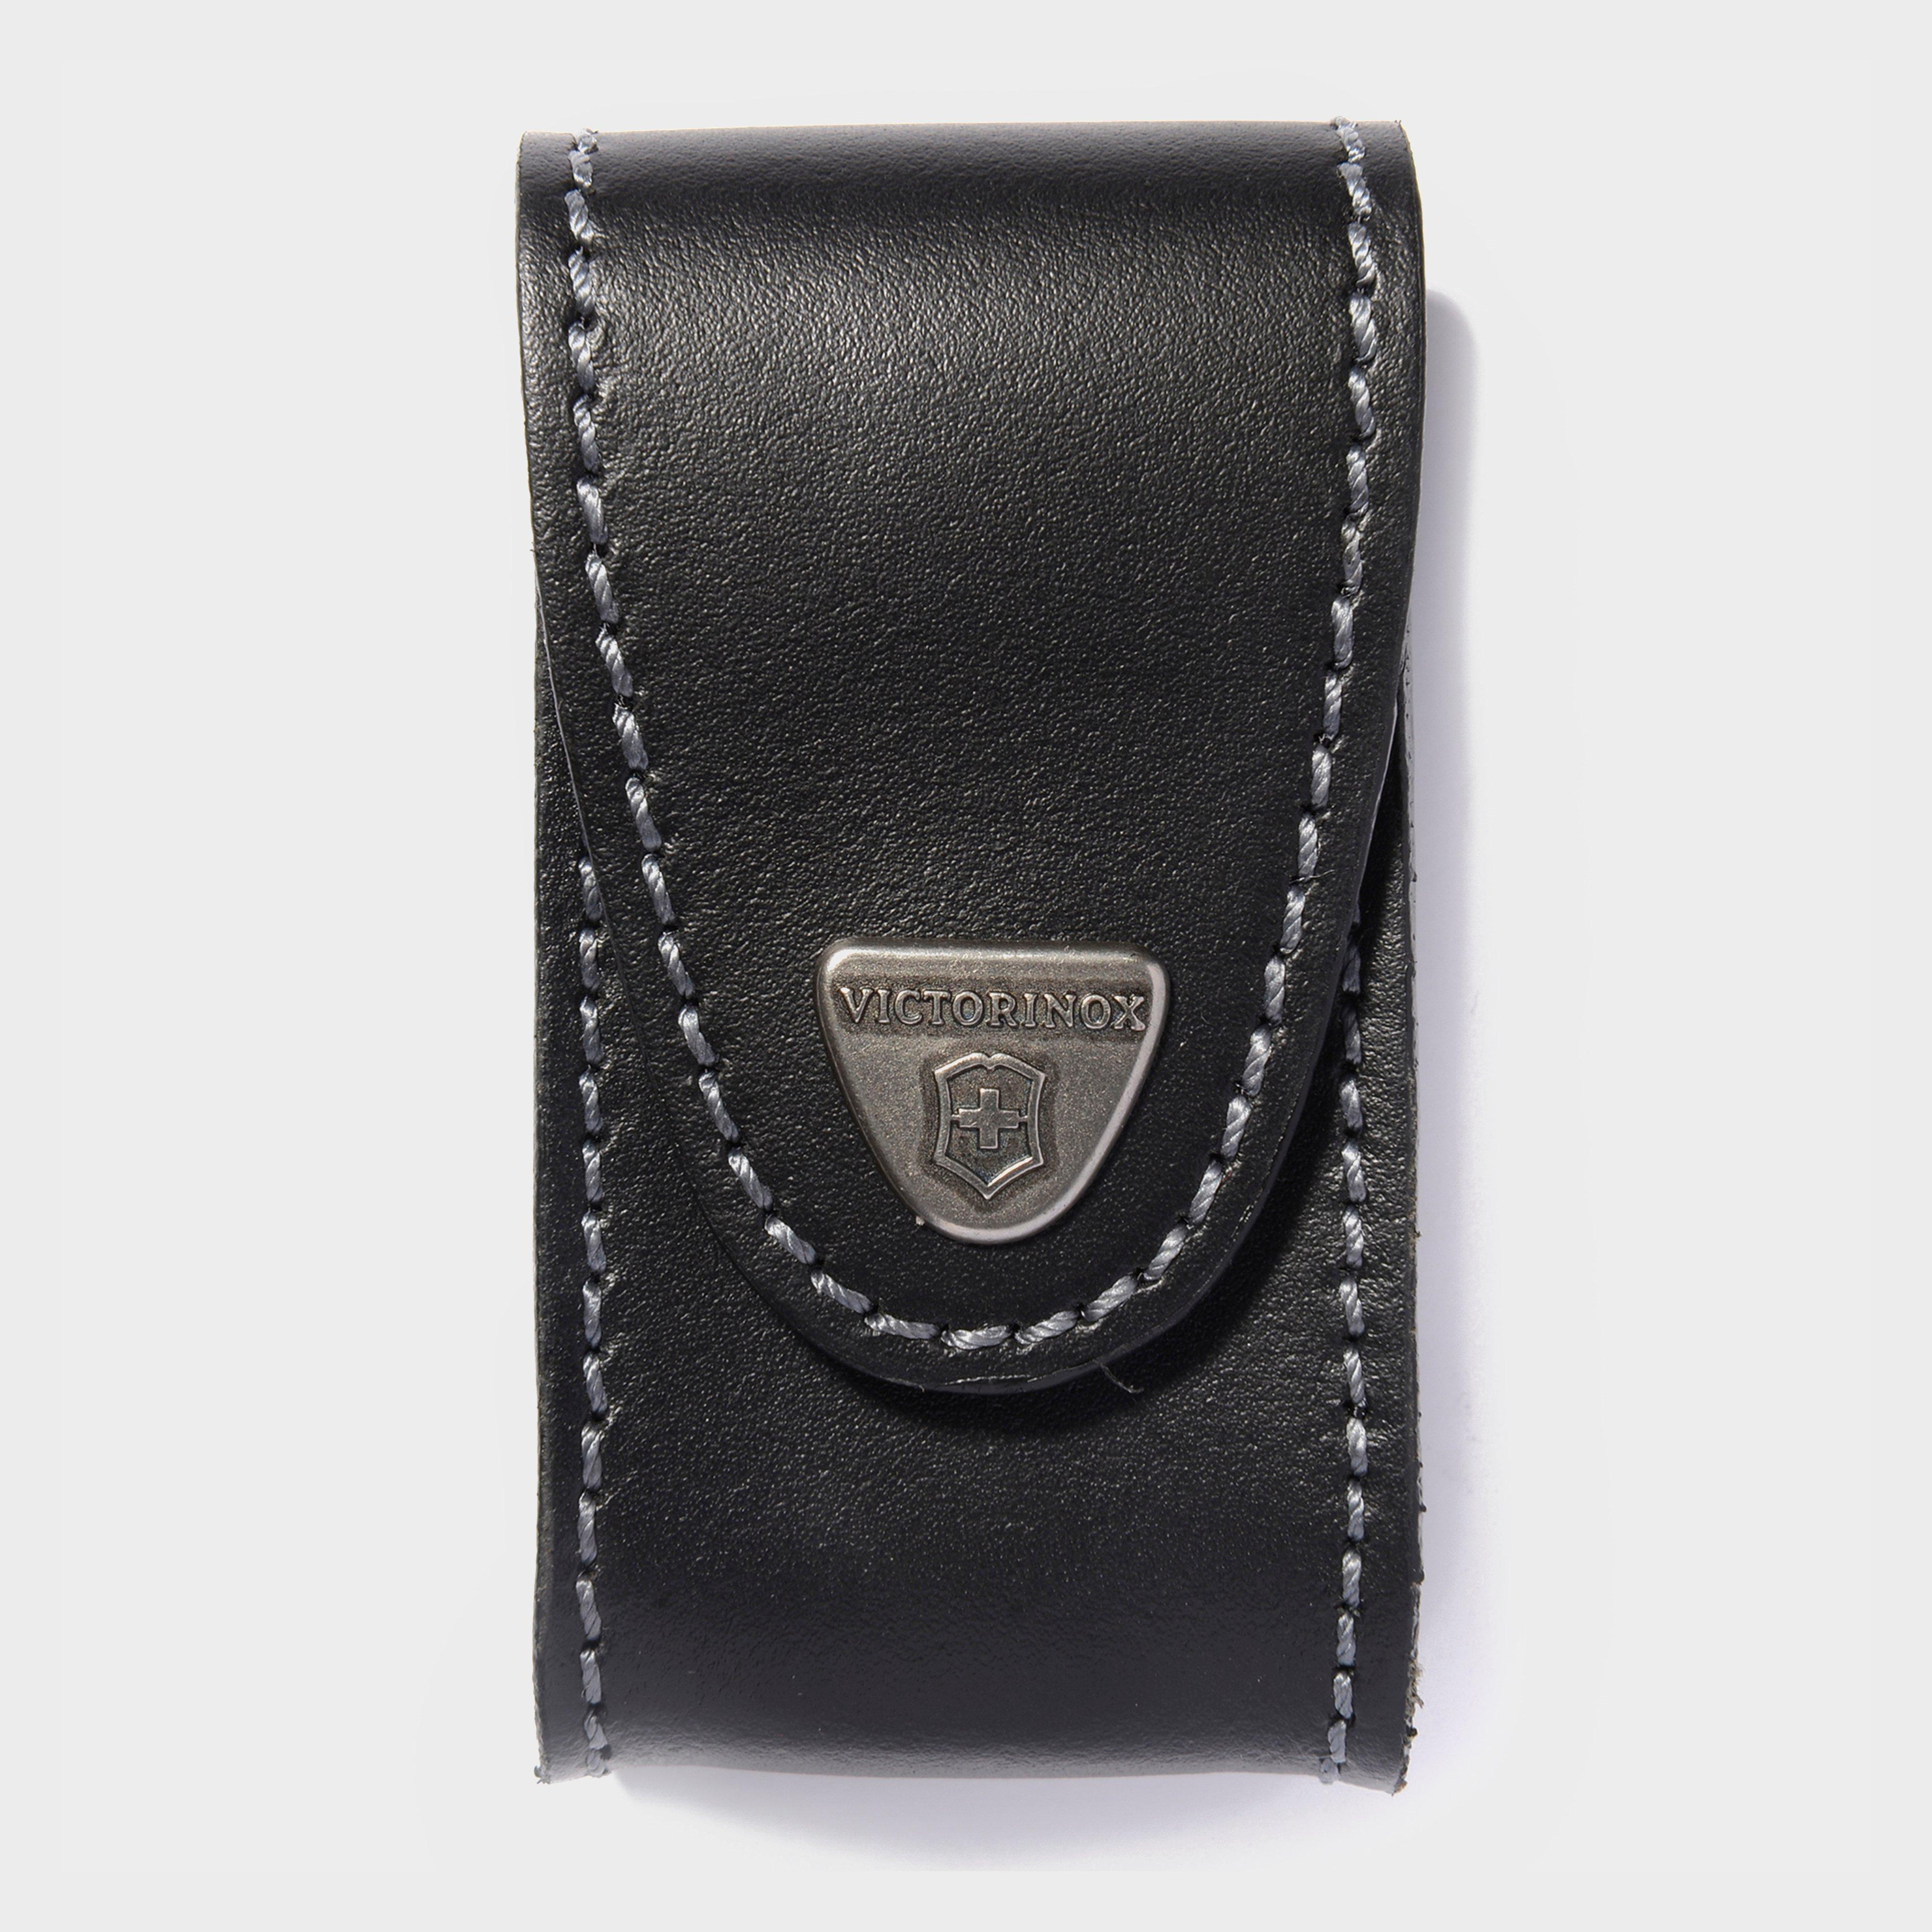 Victorinox Victorinox Pocket Knife Leather Belt Pouch 5-8 Layers - Black, Black